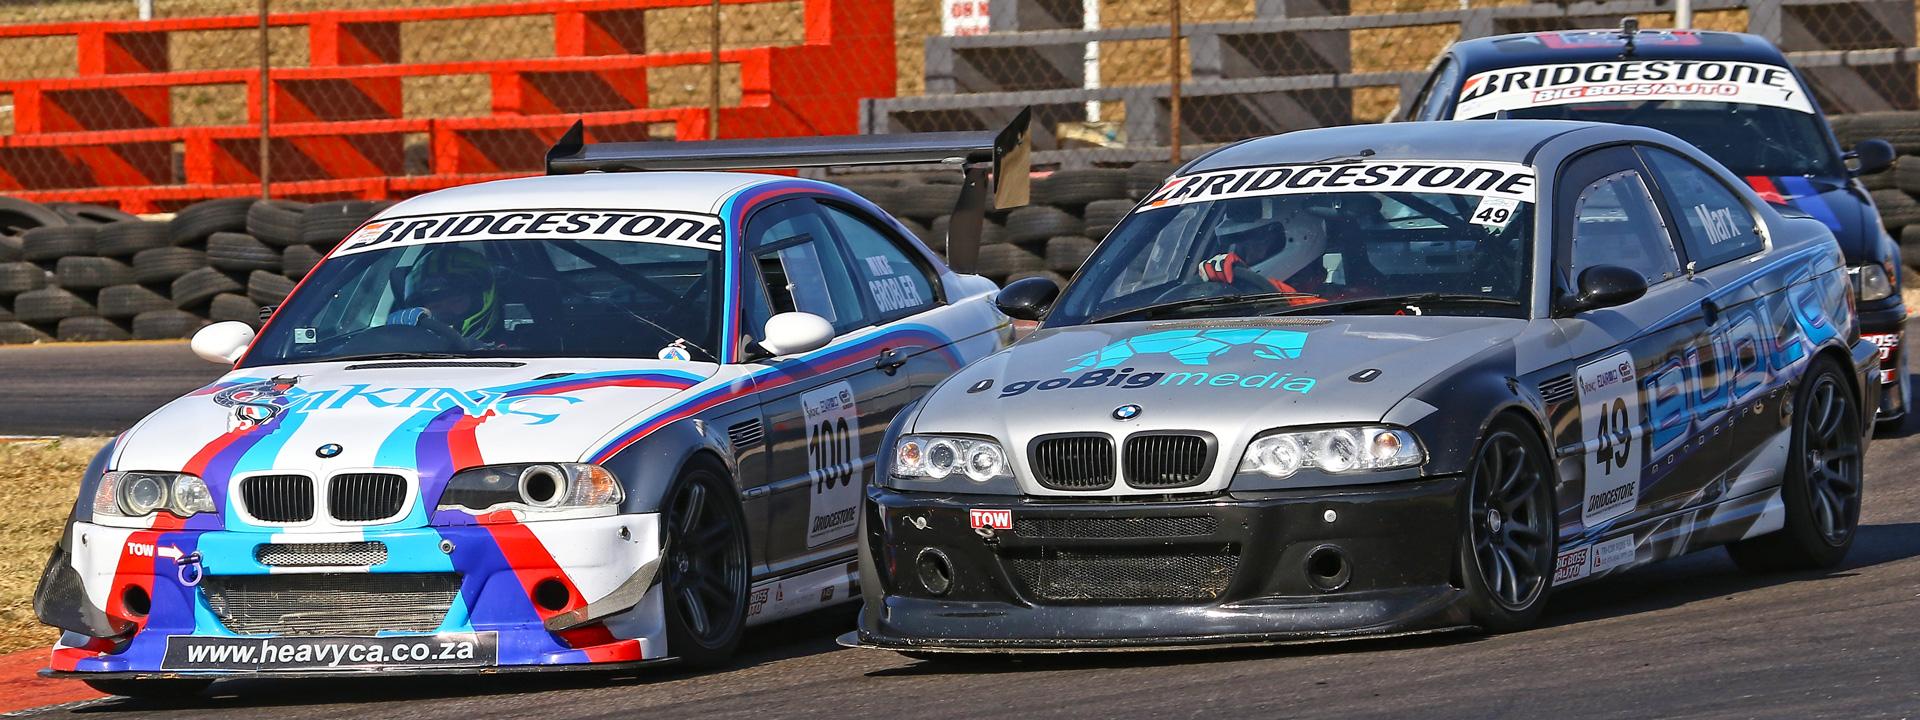 Inland Championship - Round 6 - 29 July 2017 - Zwartkops Raceway - Race Report